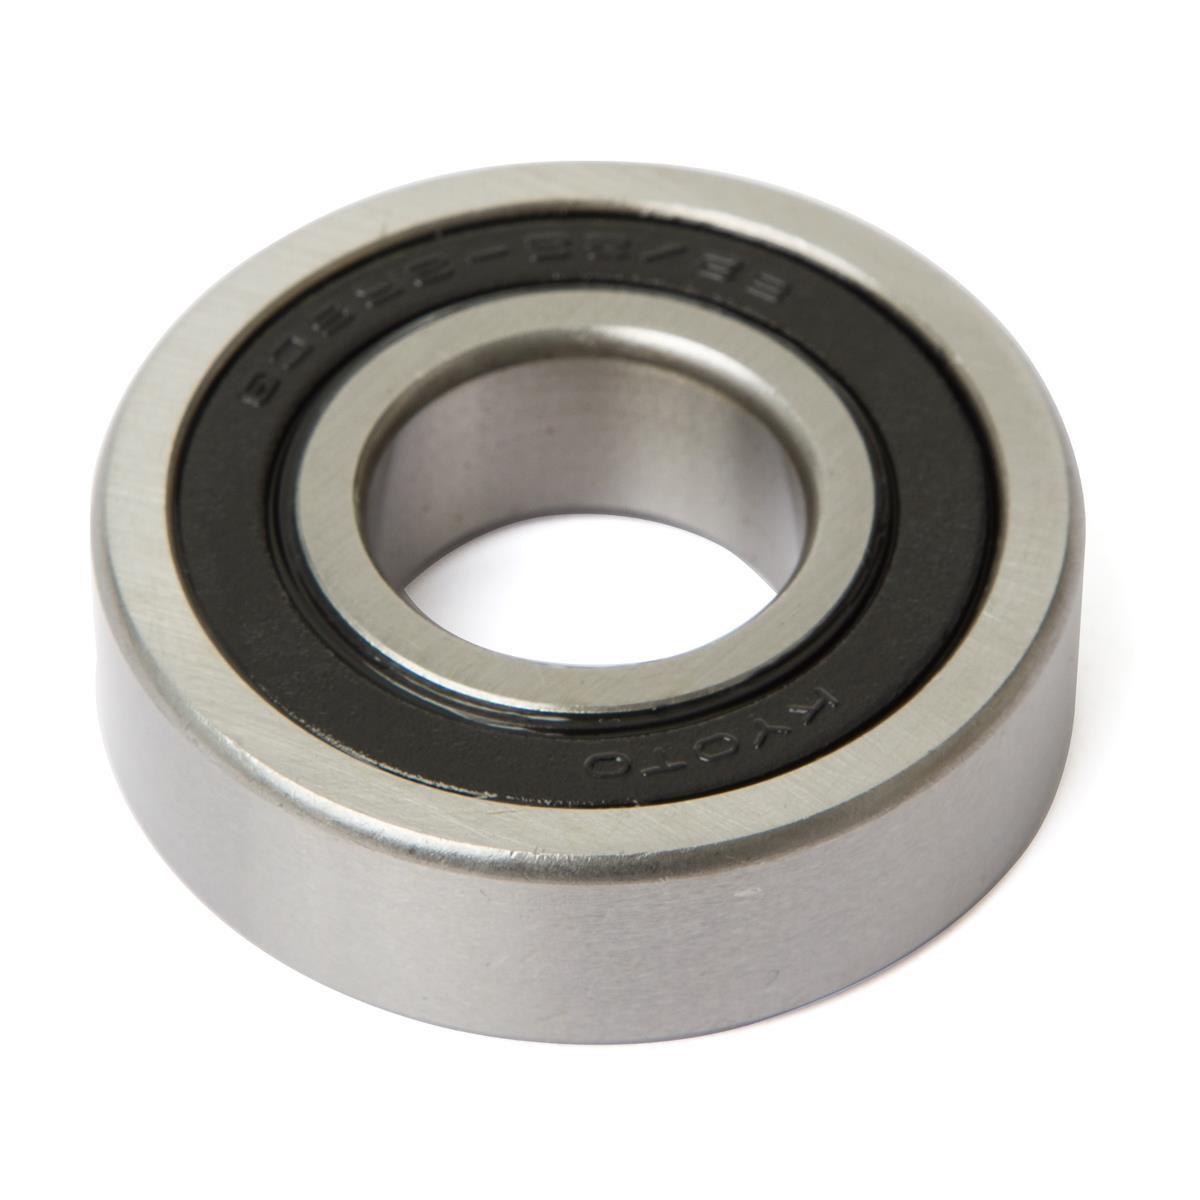 Kyoto wheel bearing 22 x 50 x 14 yamaha 62 22 rsc3 maciag offroad